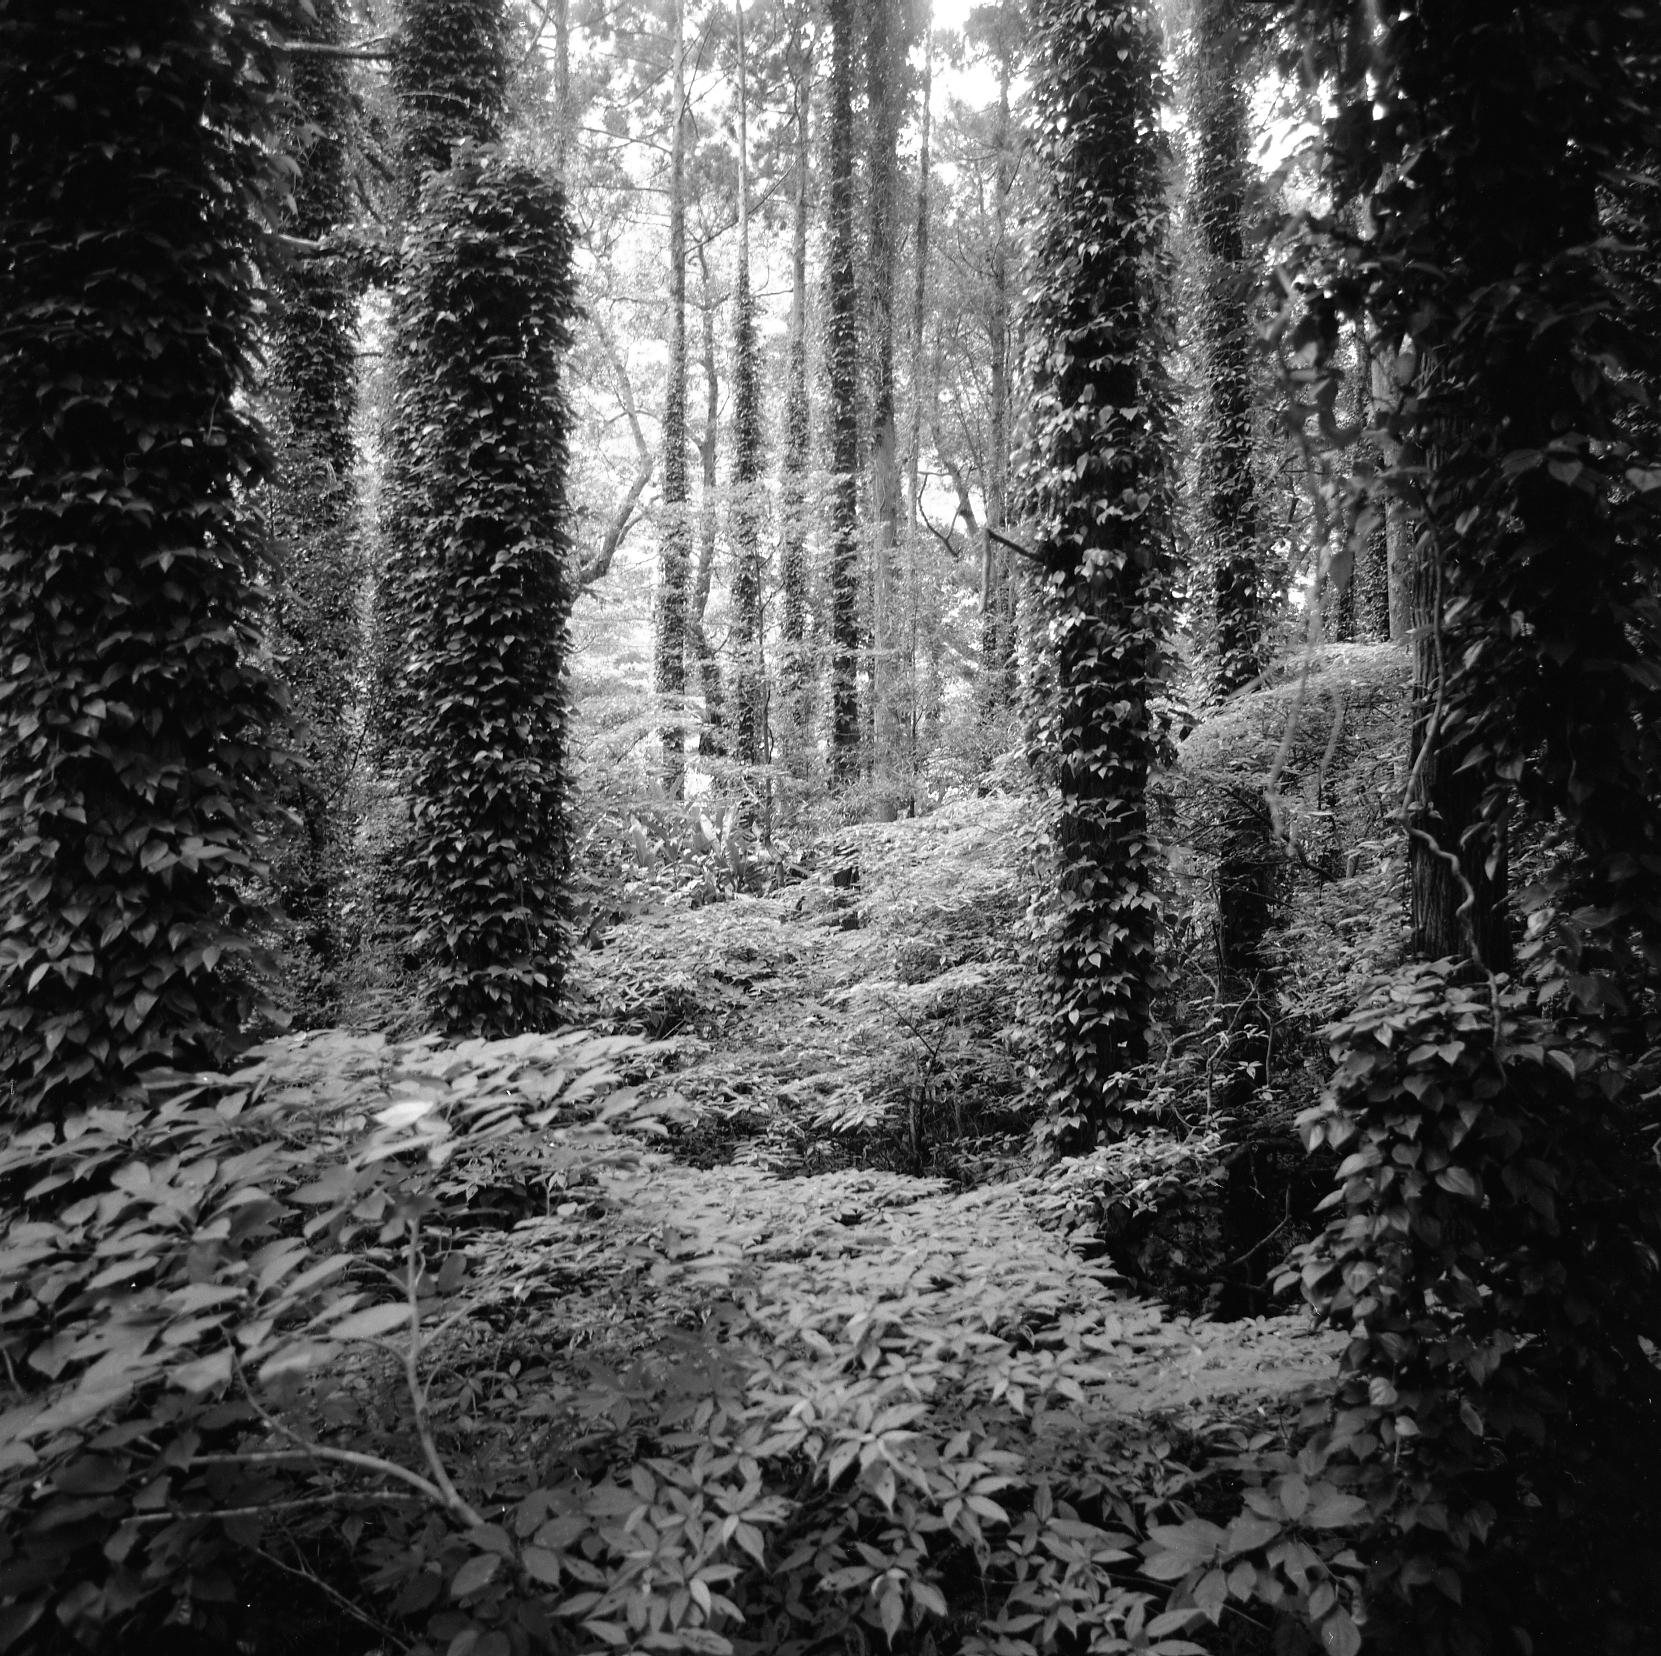 Caldera Jungle II.jpg